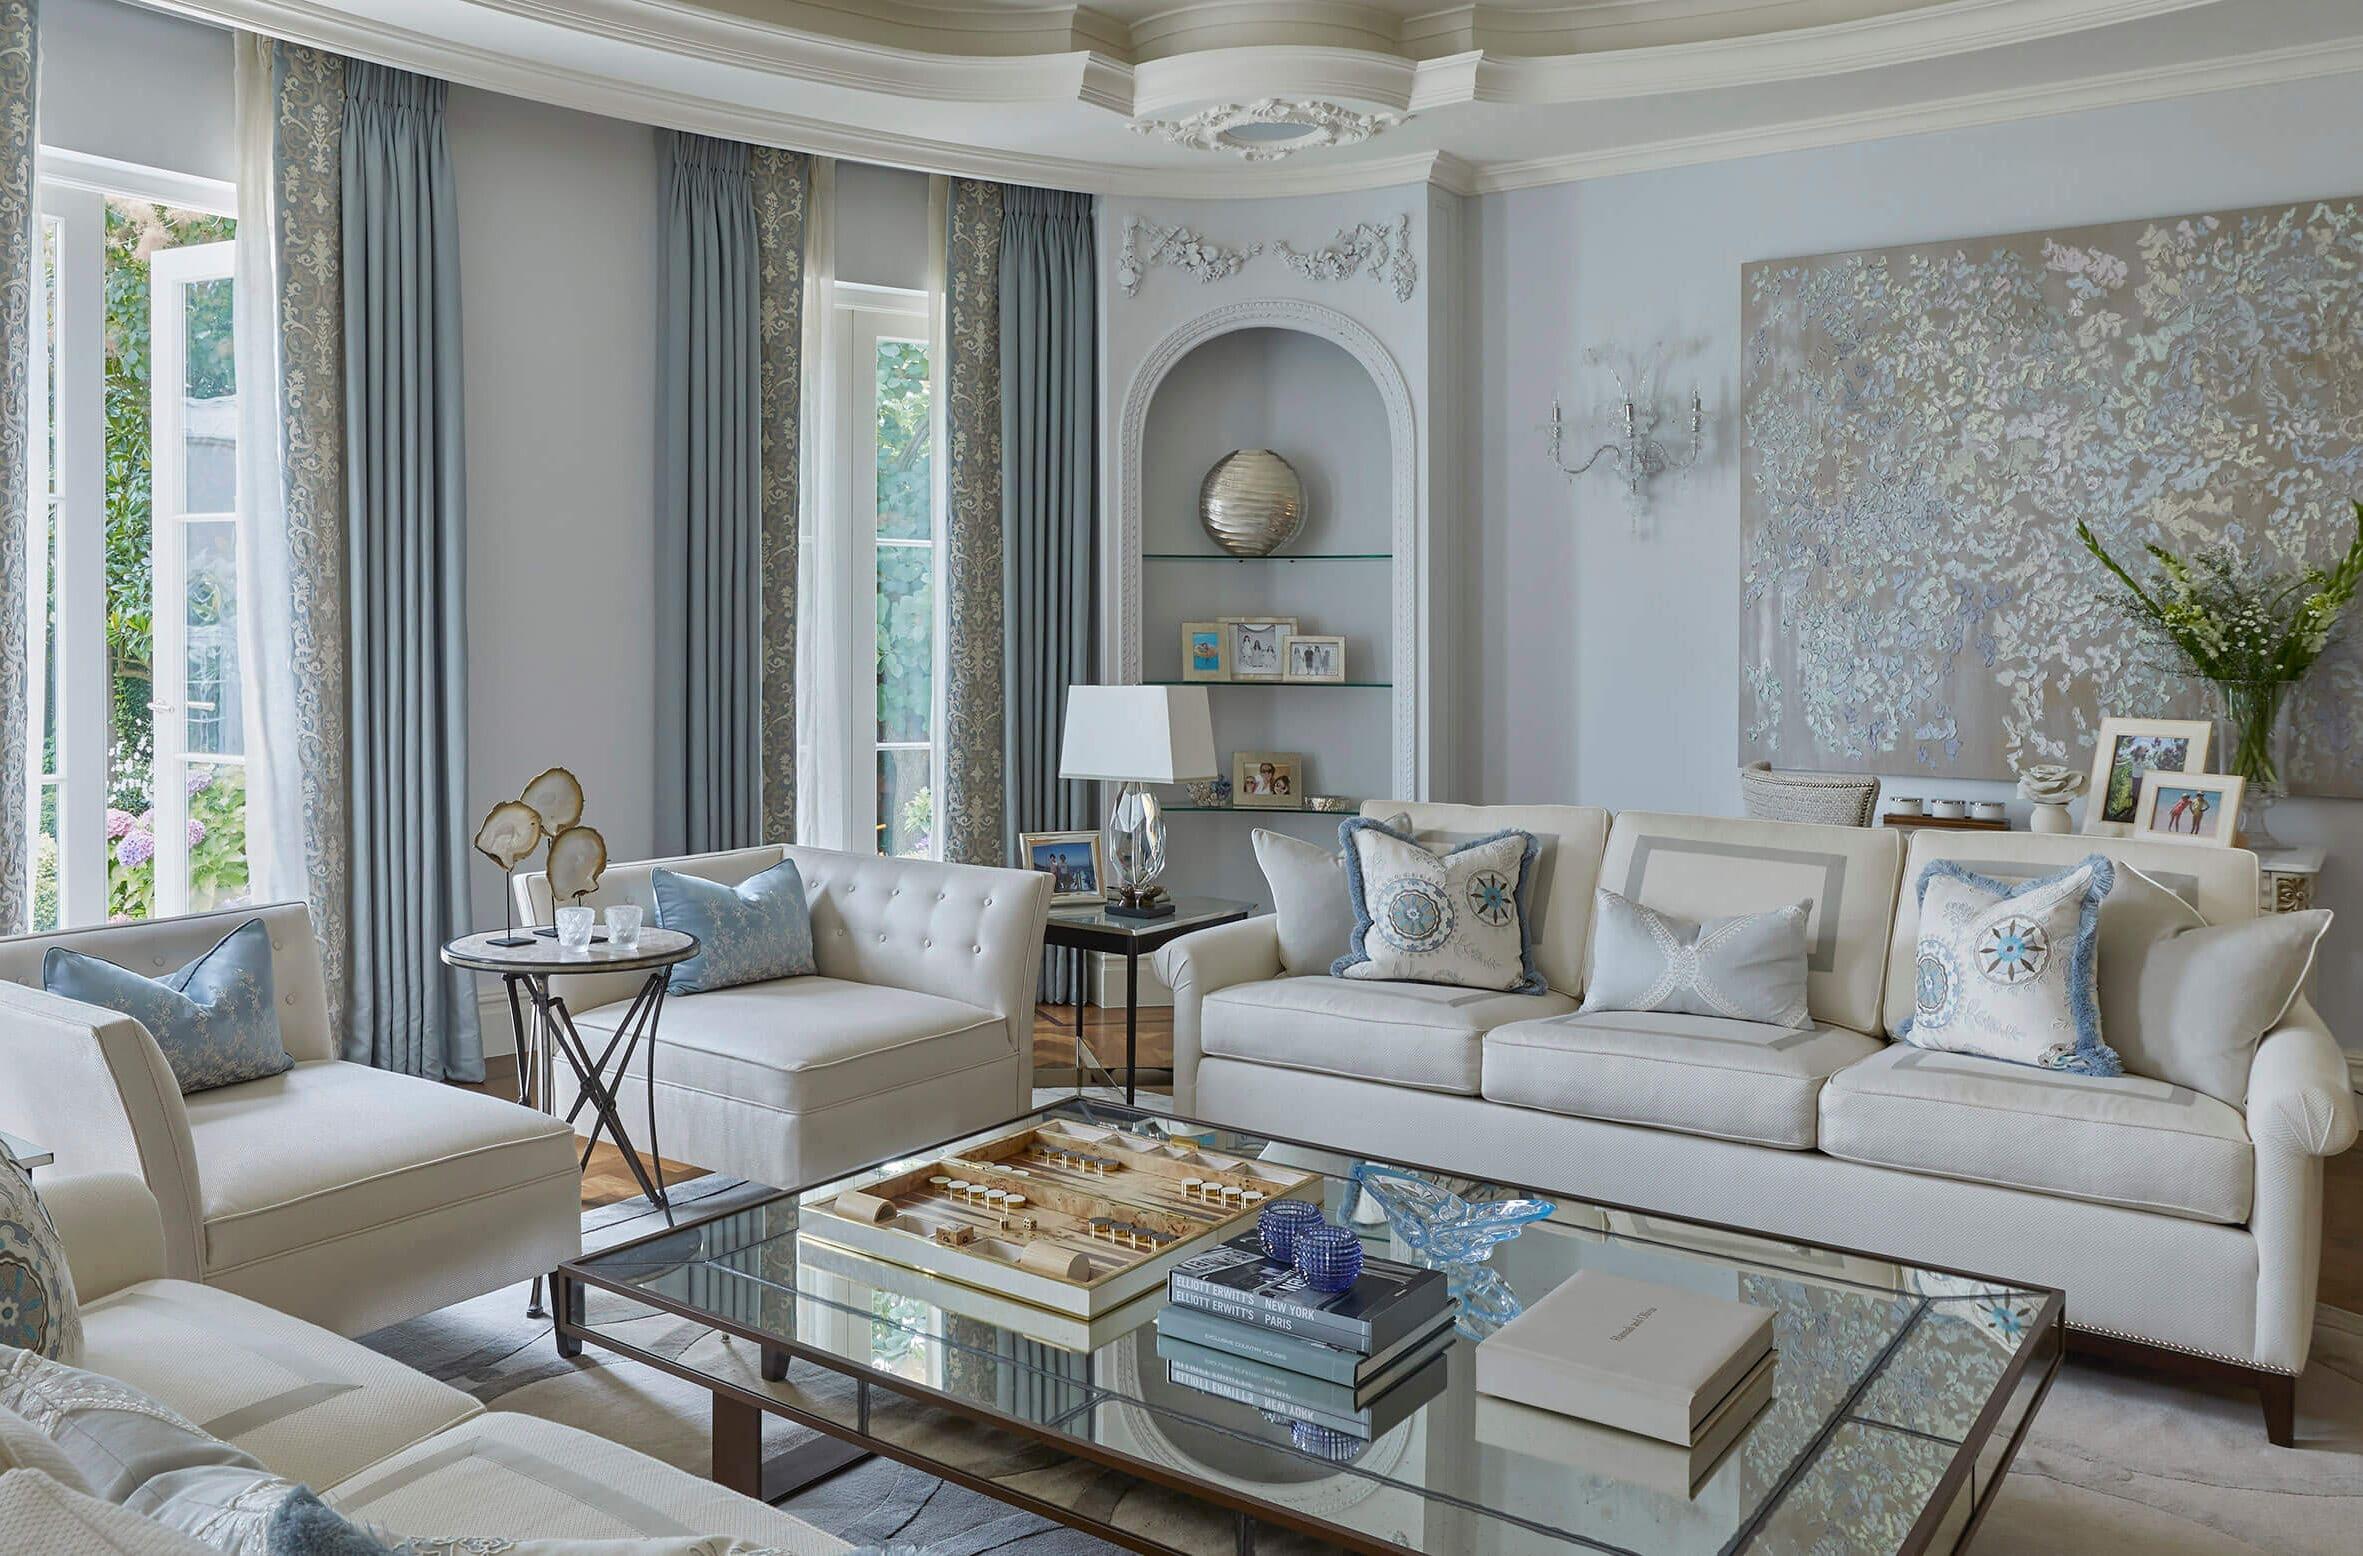 Classic family home interior design